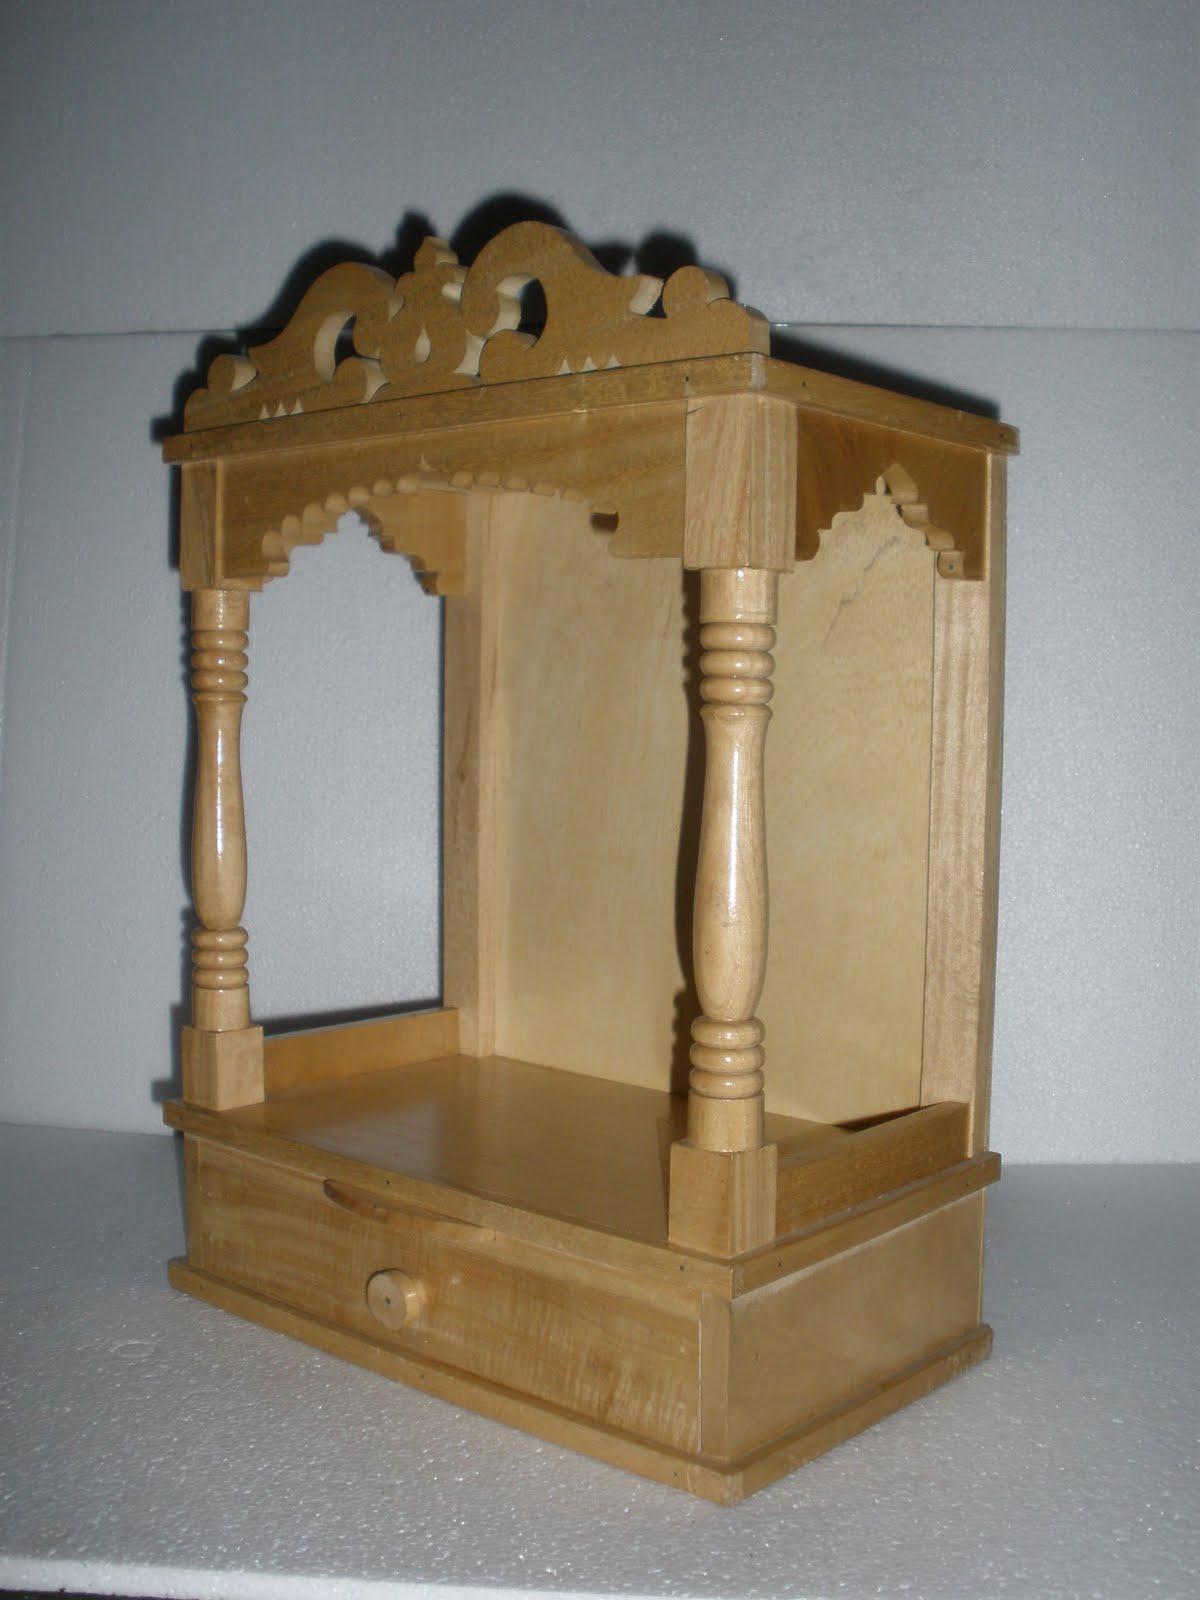 Simple Wooden Mandir Designs For Home